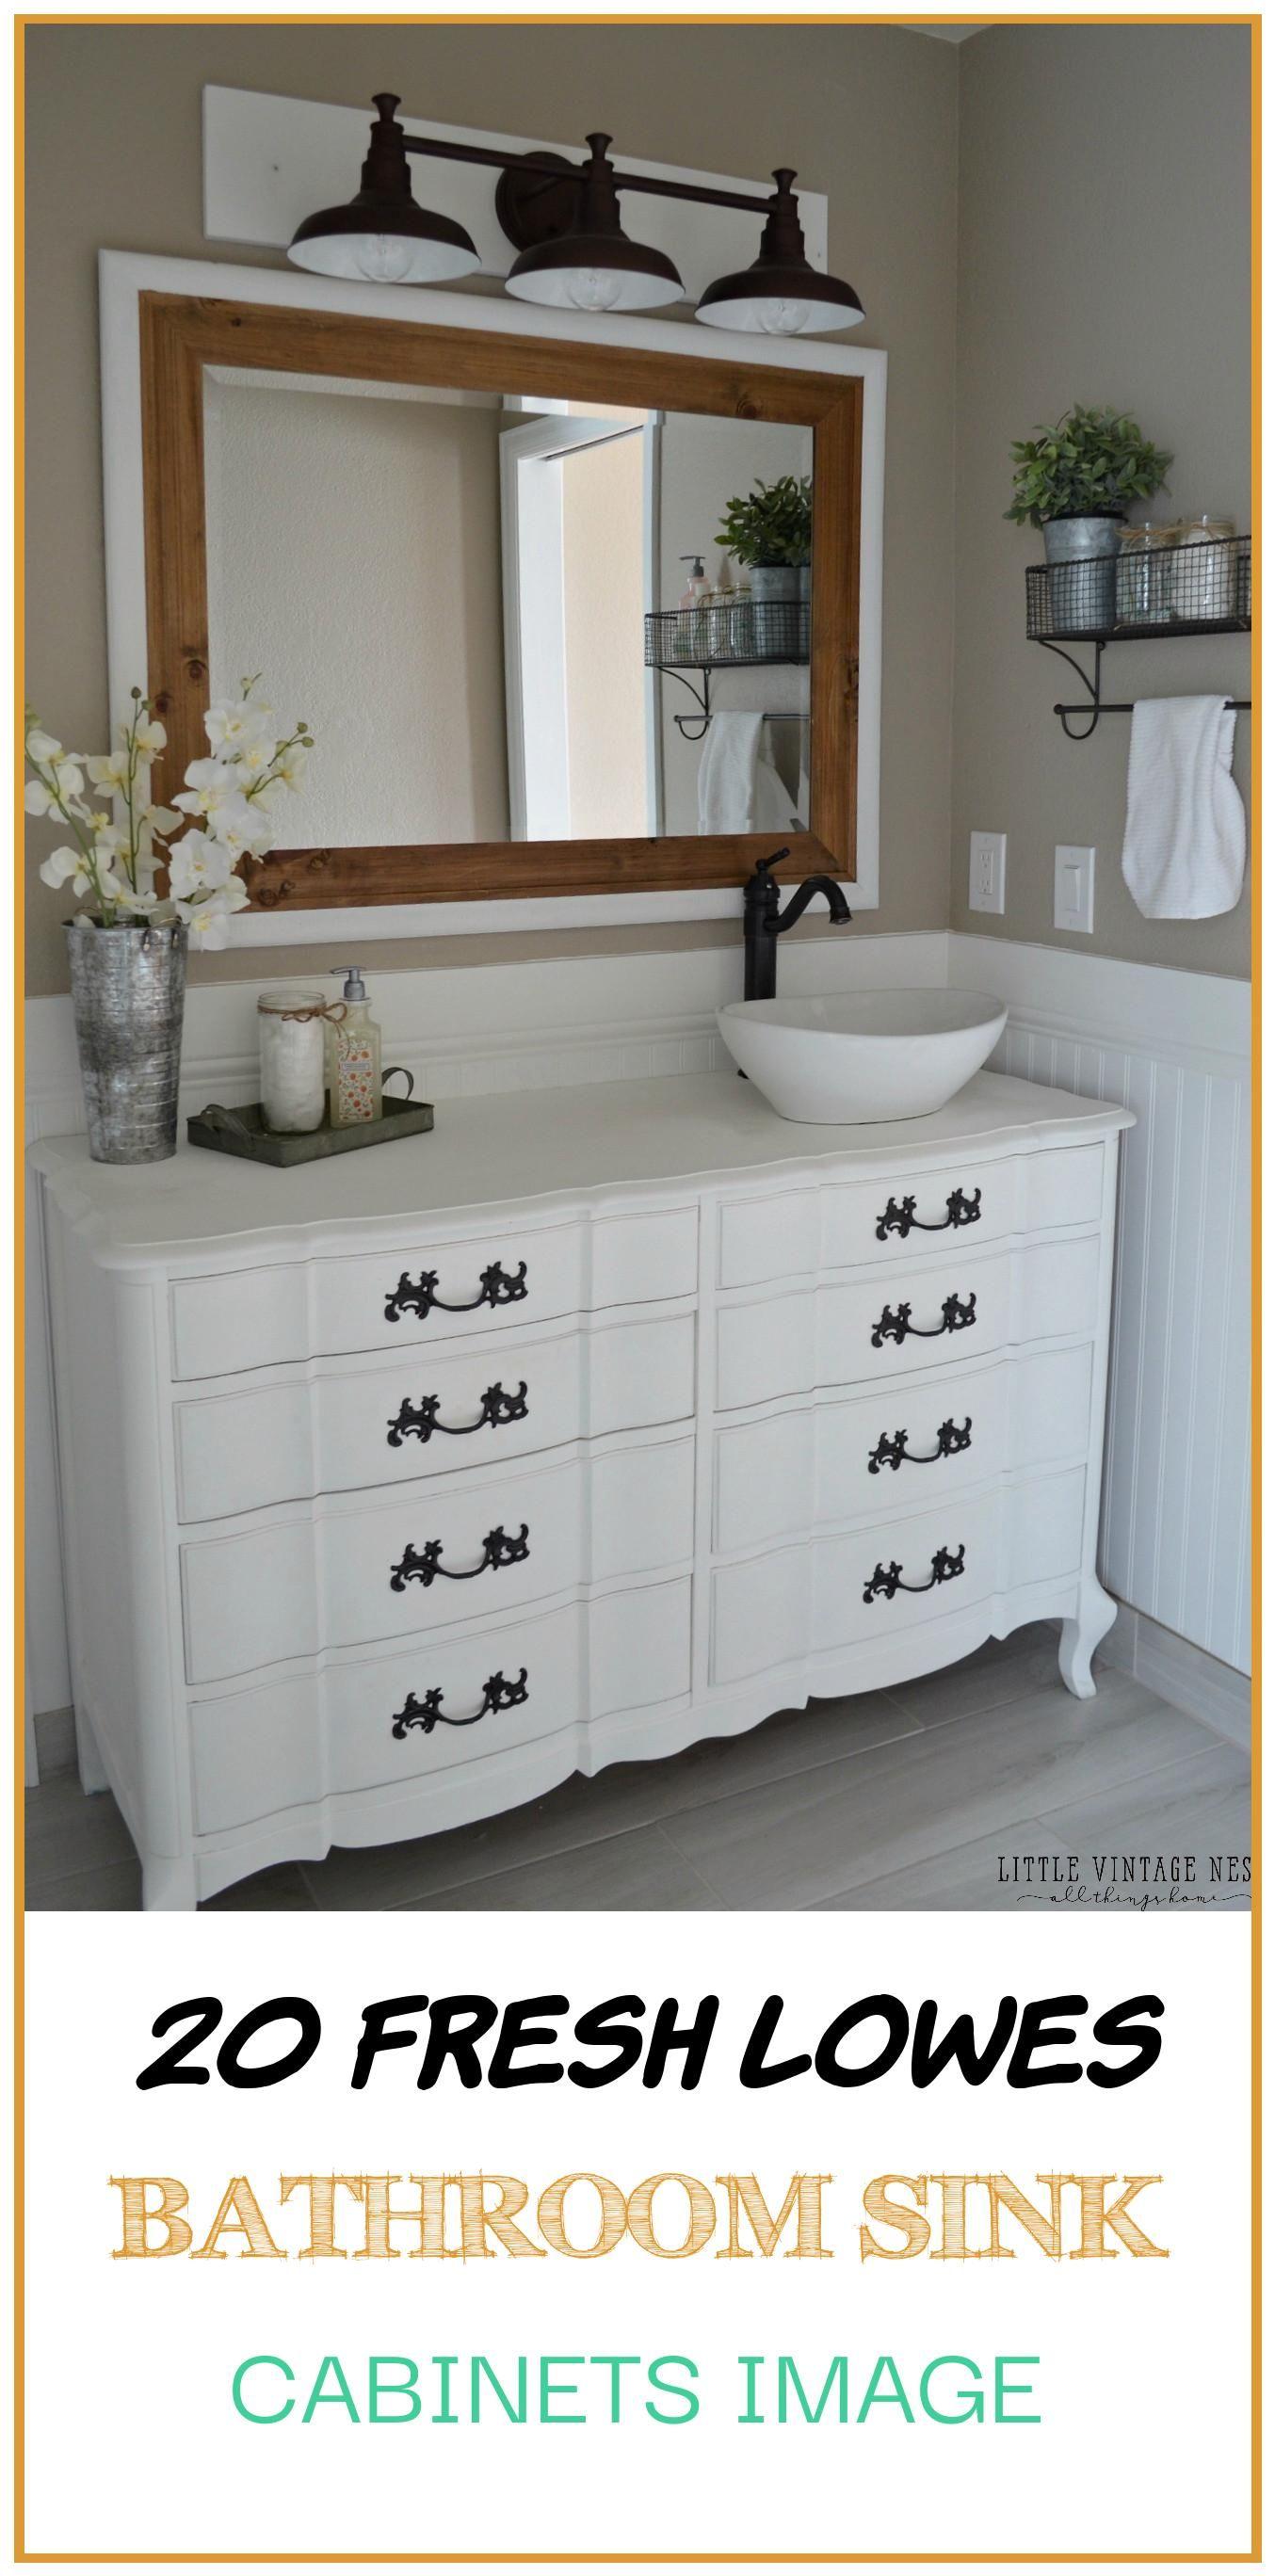 7 Extraordinary Lowes Bathroom Sink Cabinets Collection Bathroom Sink Cabinets Sink Cabinet Lowes Bathroom Sinks